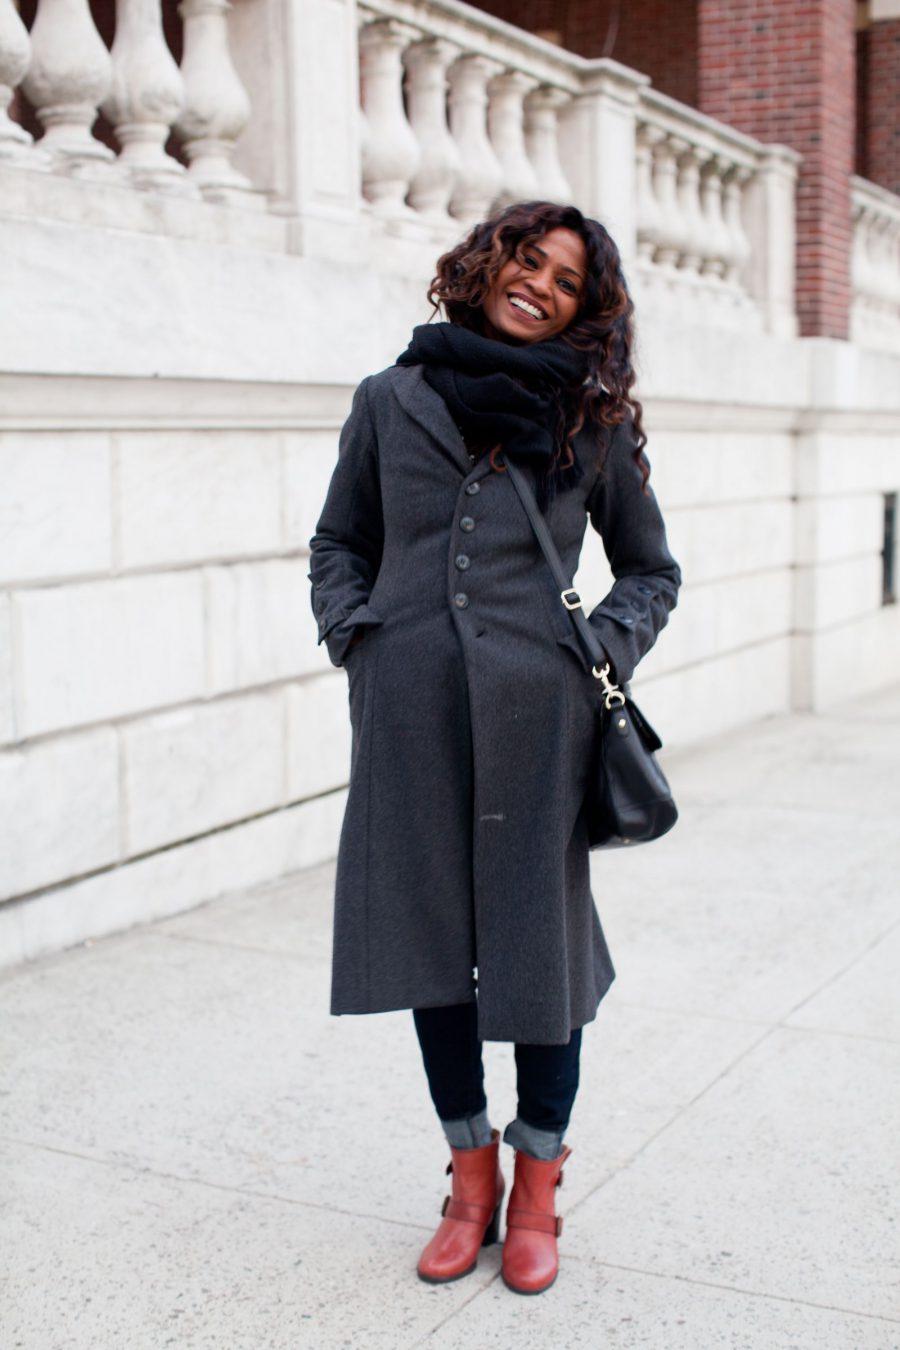 Best Winter Coats Womens 2021 Best Winter Coats For Women 2020 2021 | B2B Fashion